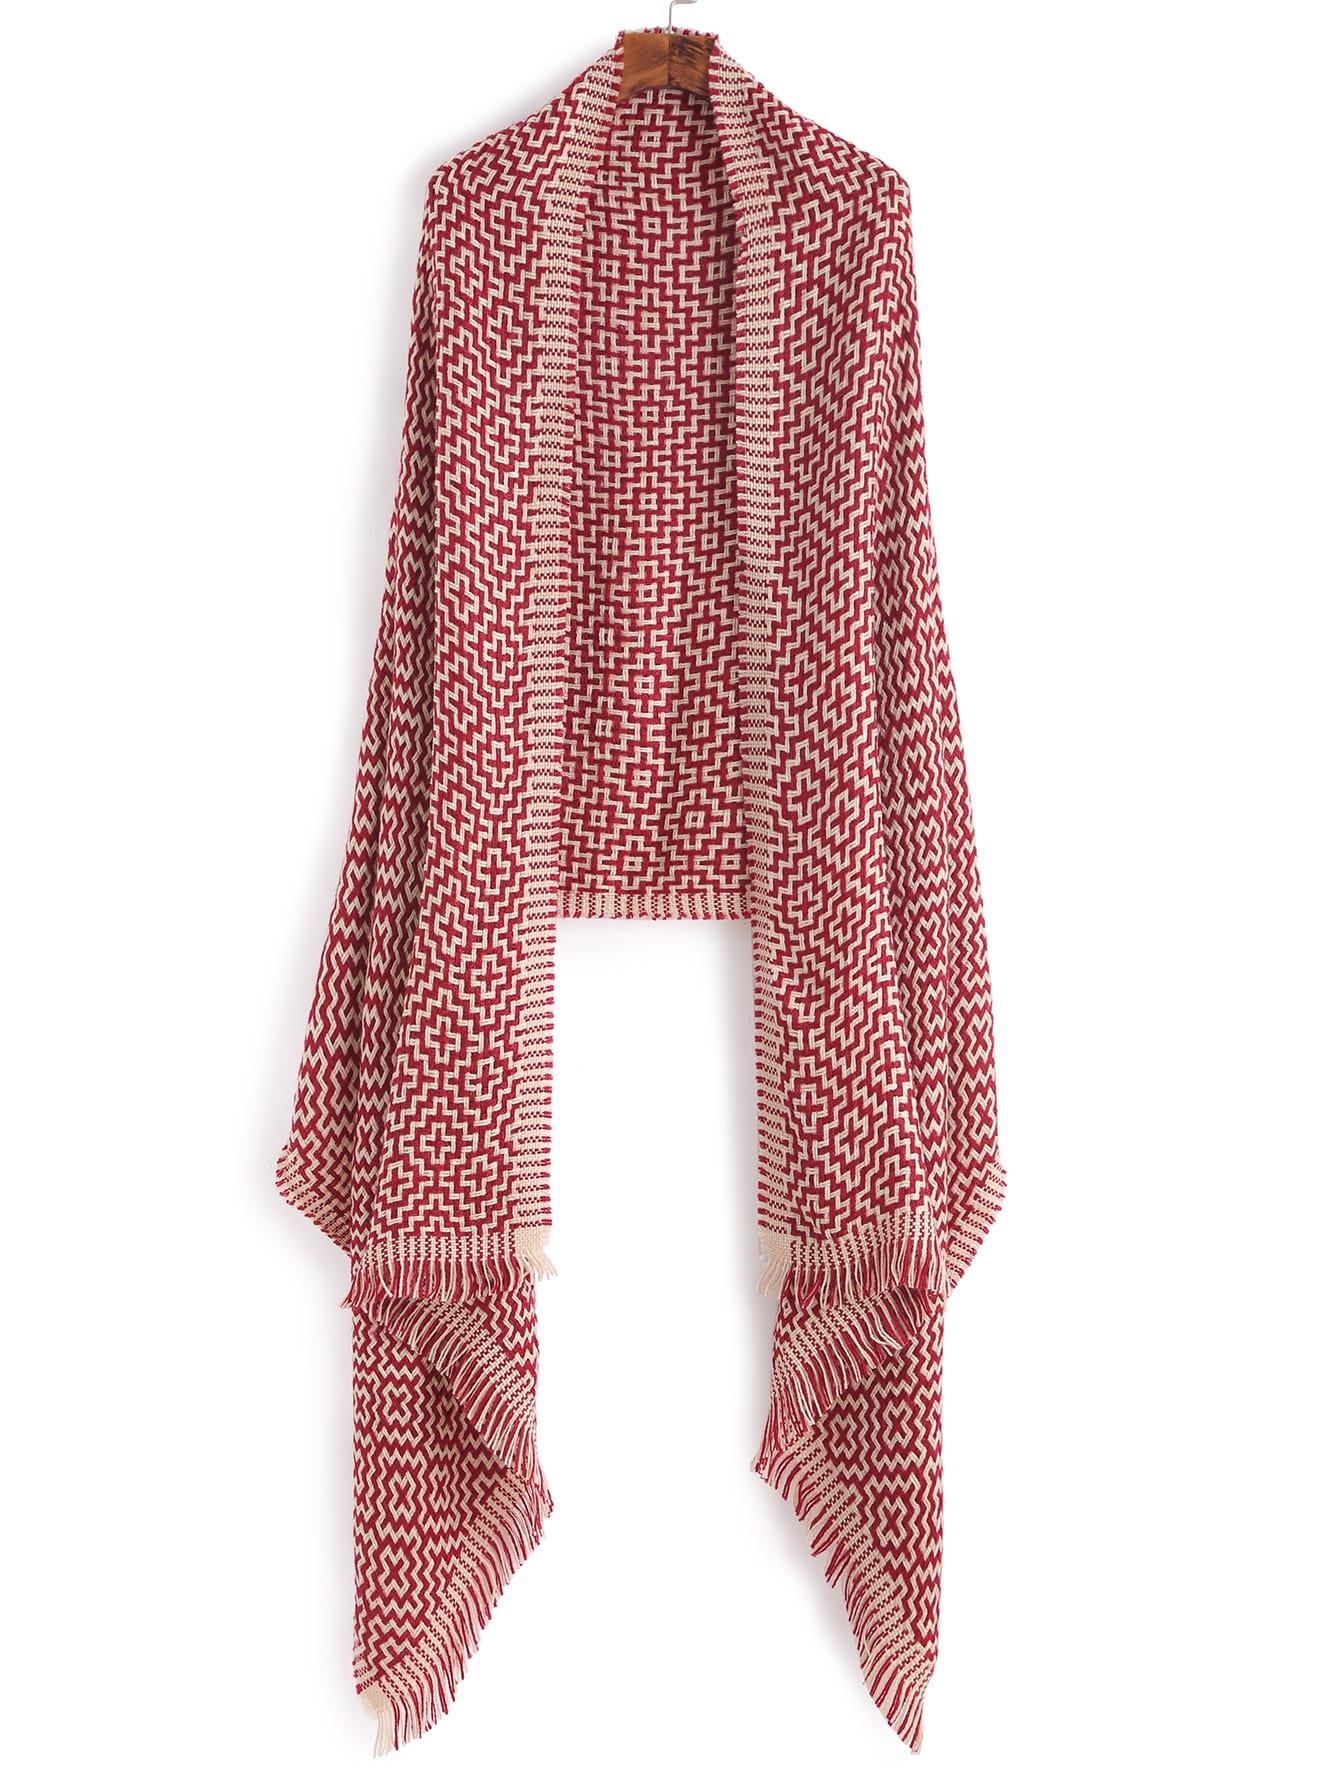 Chinese Knitting Patterns : Lacey Scarf Pattern Knitting - Search